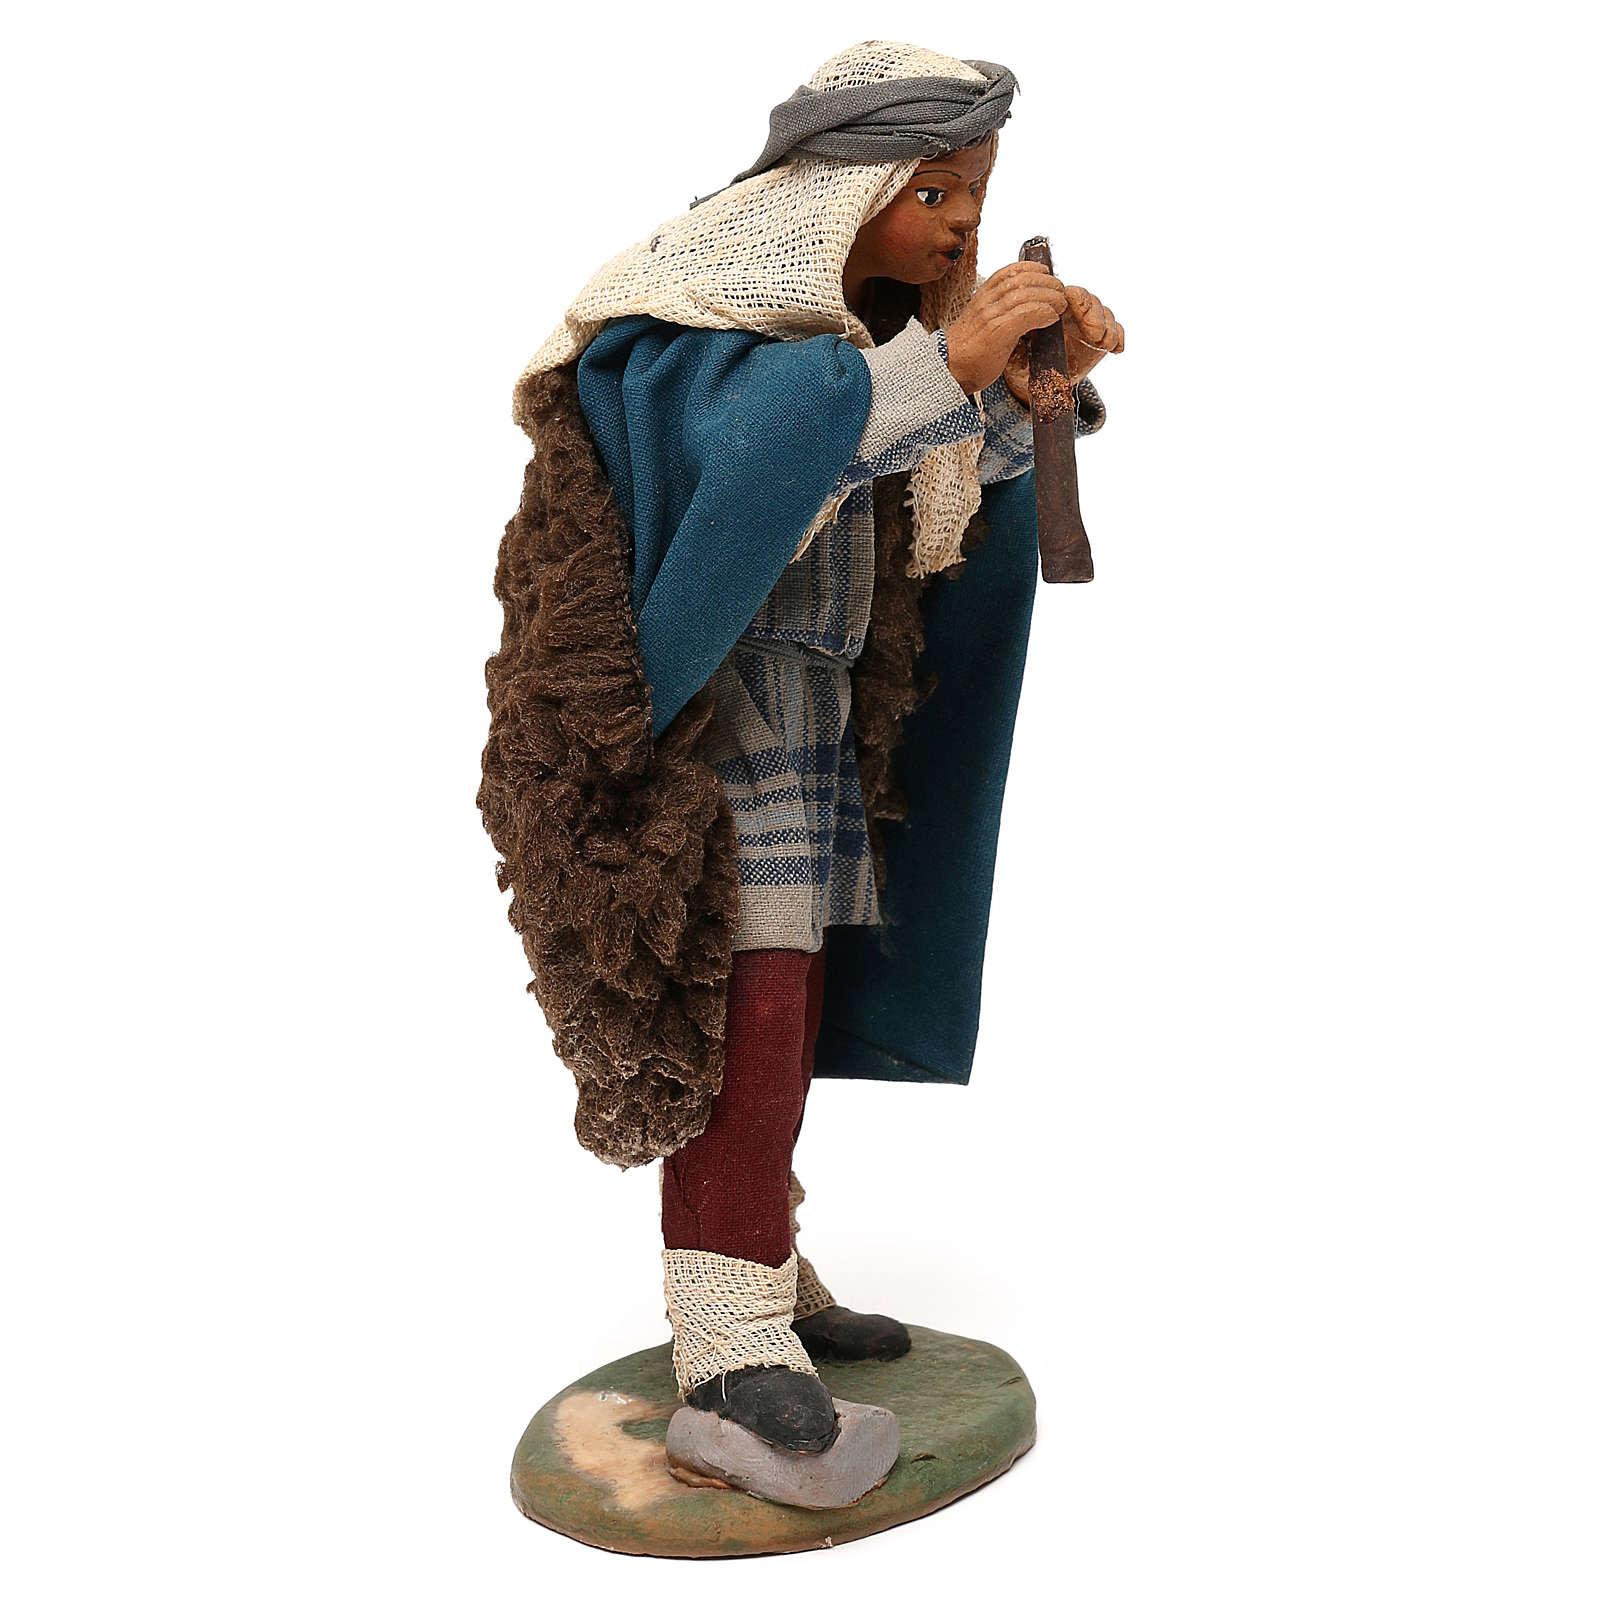 STOCK Flautista vestido terracota de 18 cm belén napolitano 4